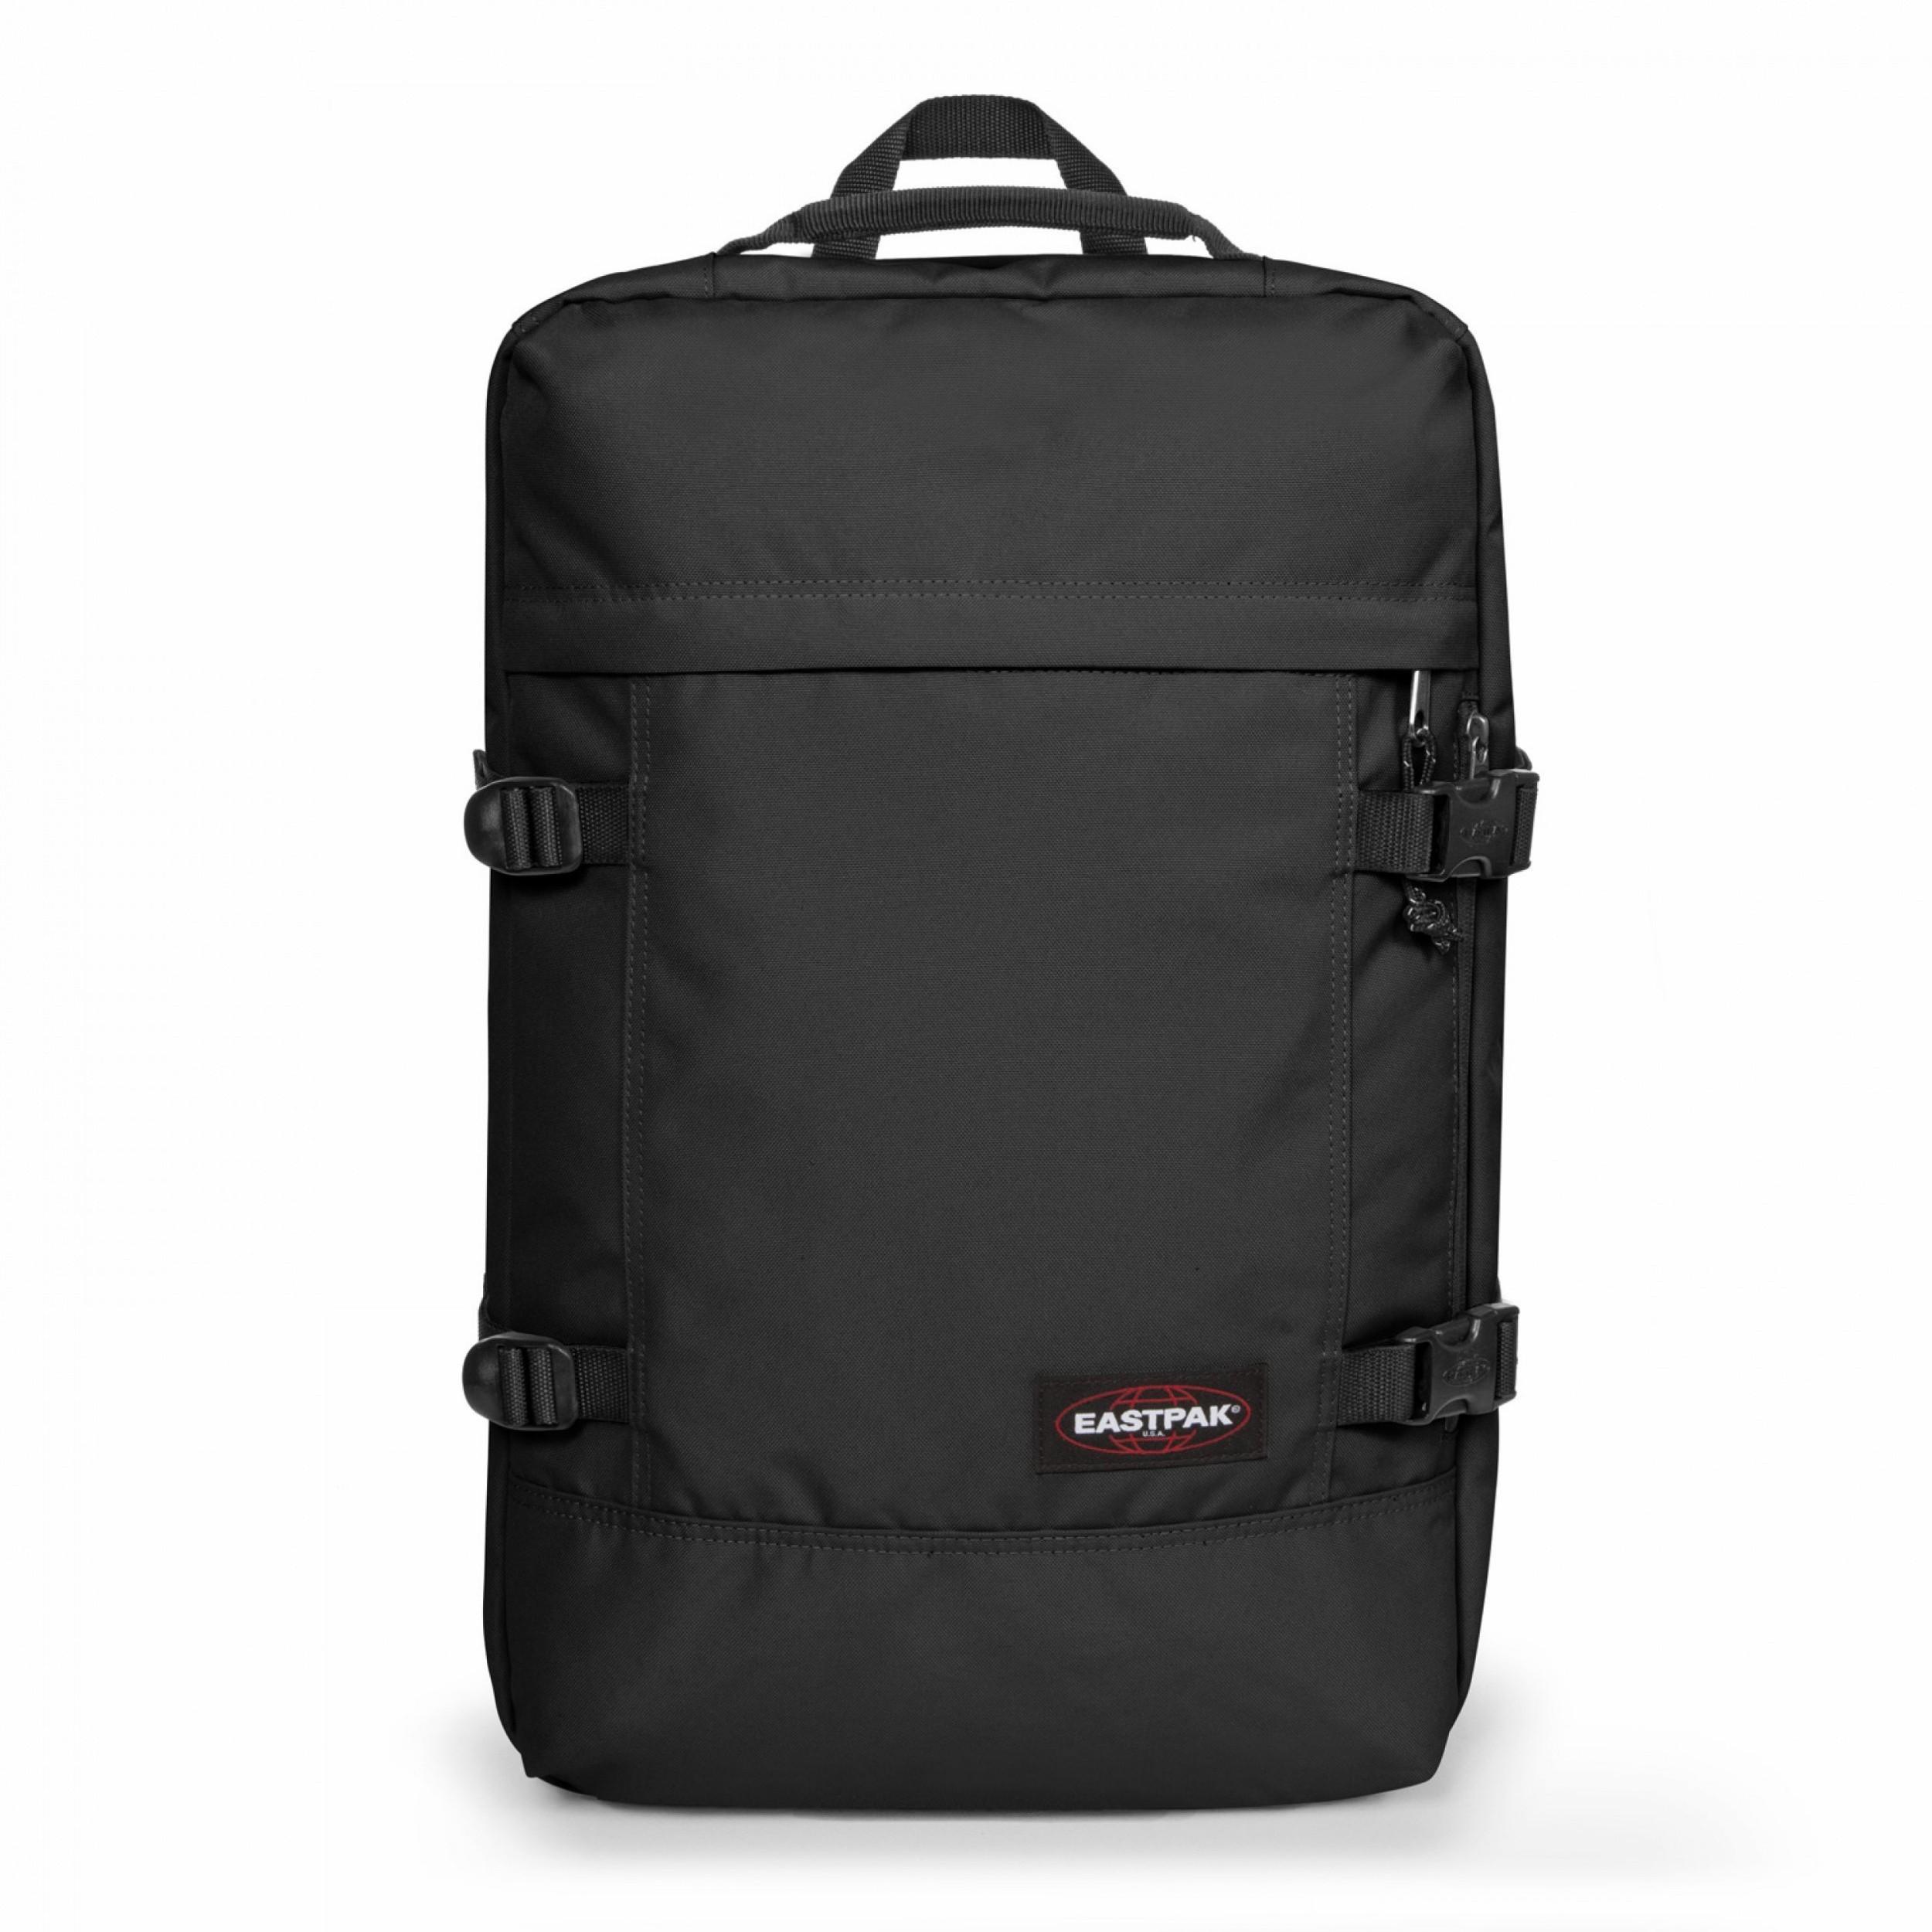 Eastpak TRANZPACK Cabin Bag Black